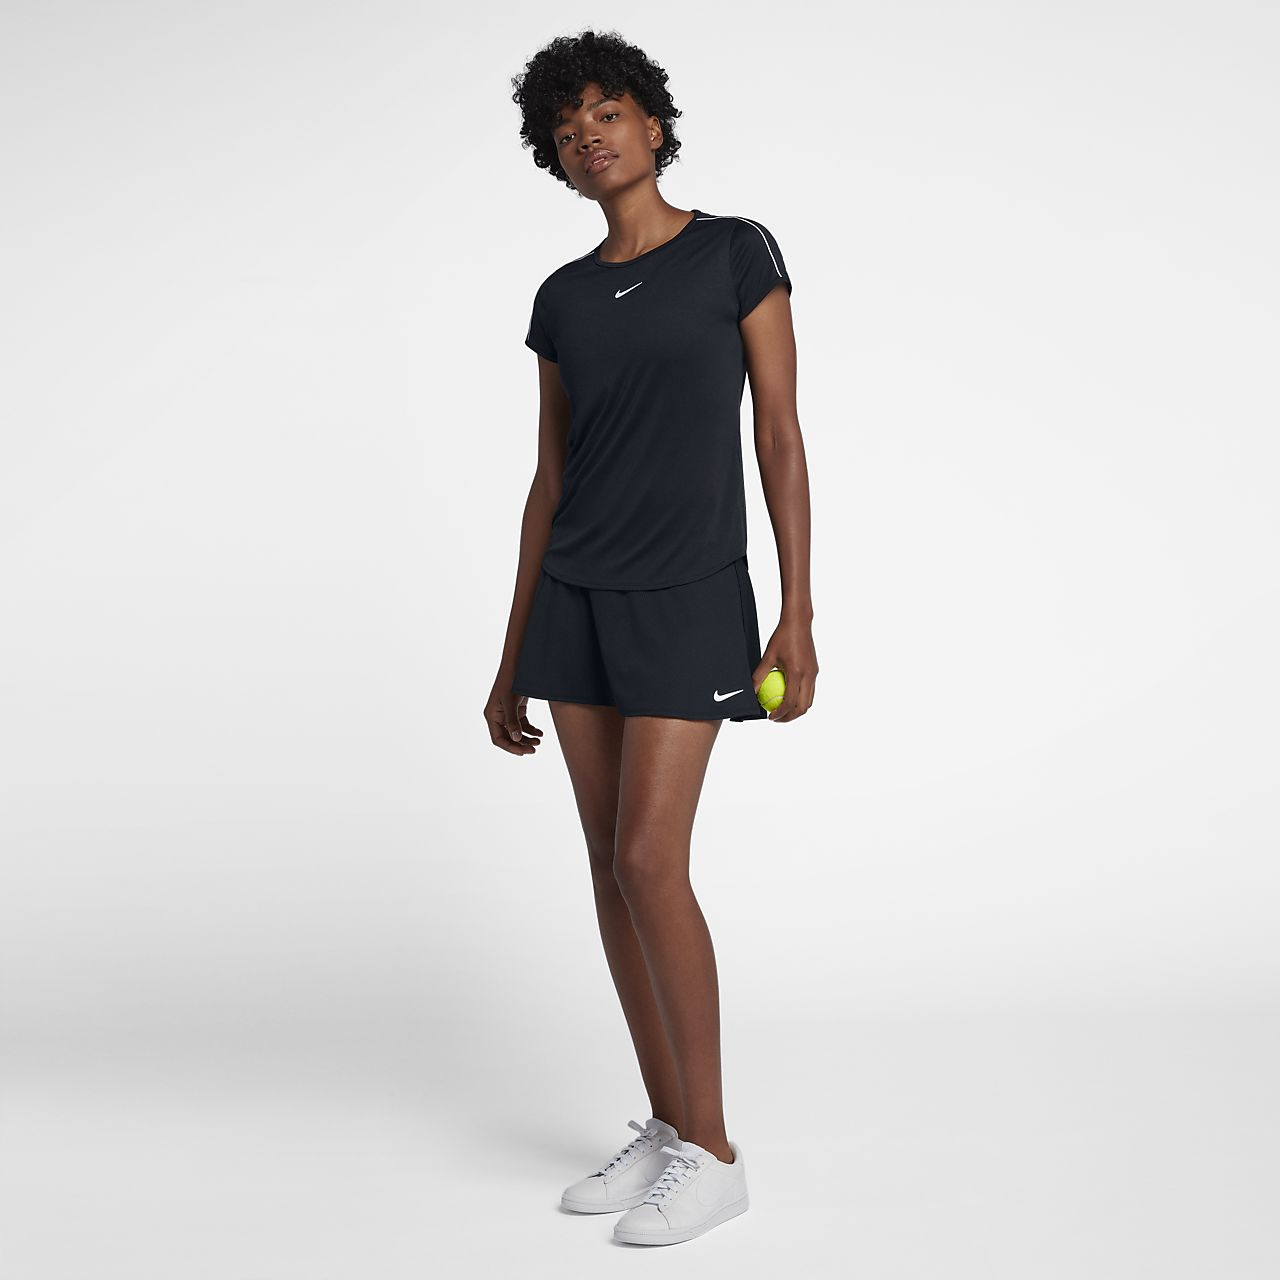 Tennis Da Nikecourt Fit Dri DonnaEso Top vNmwOy8n0